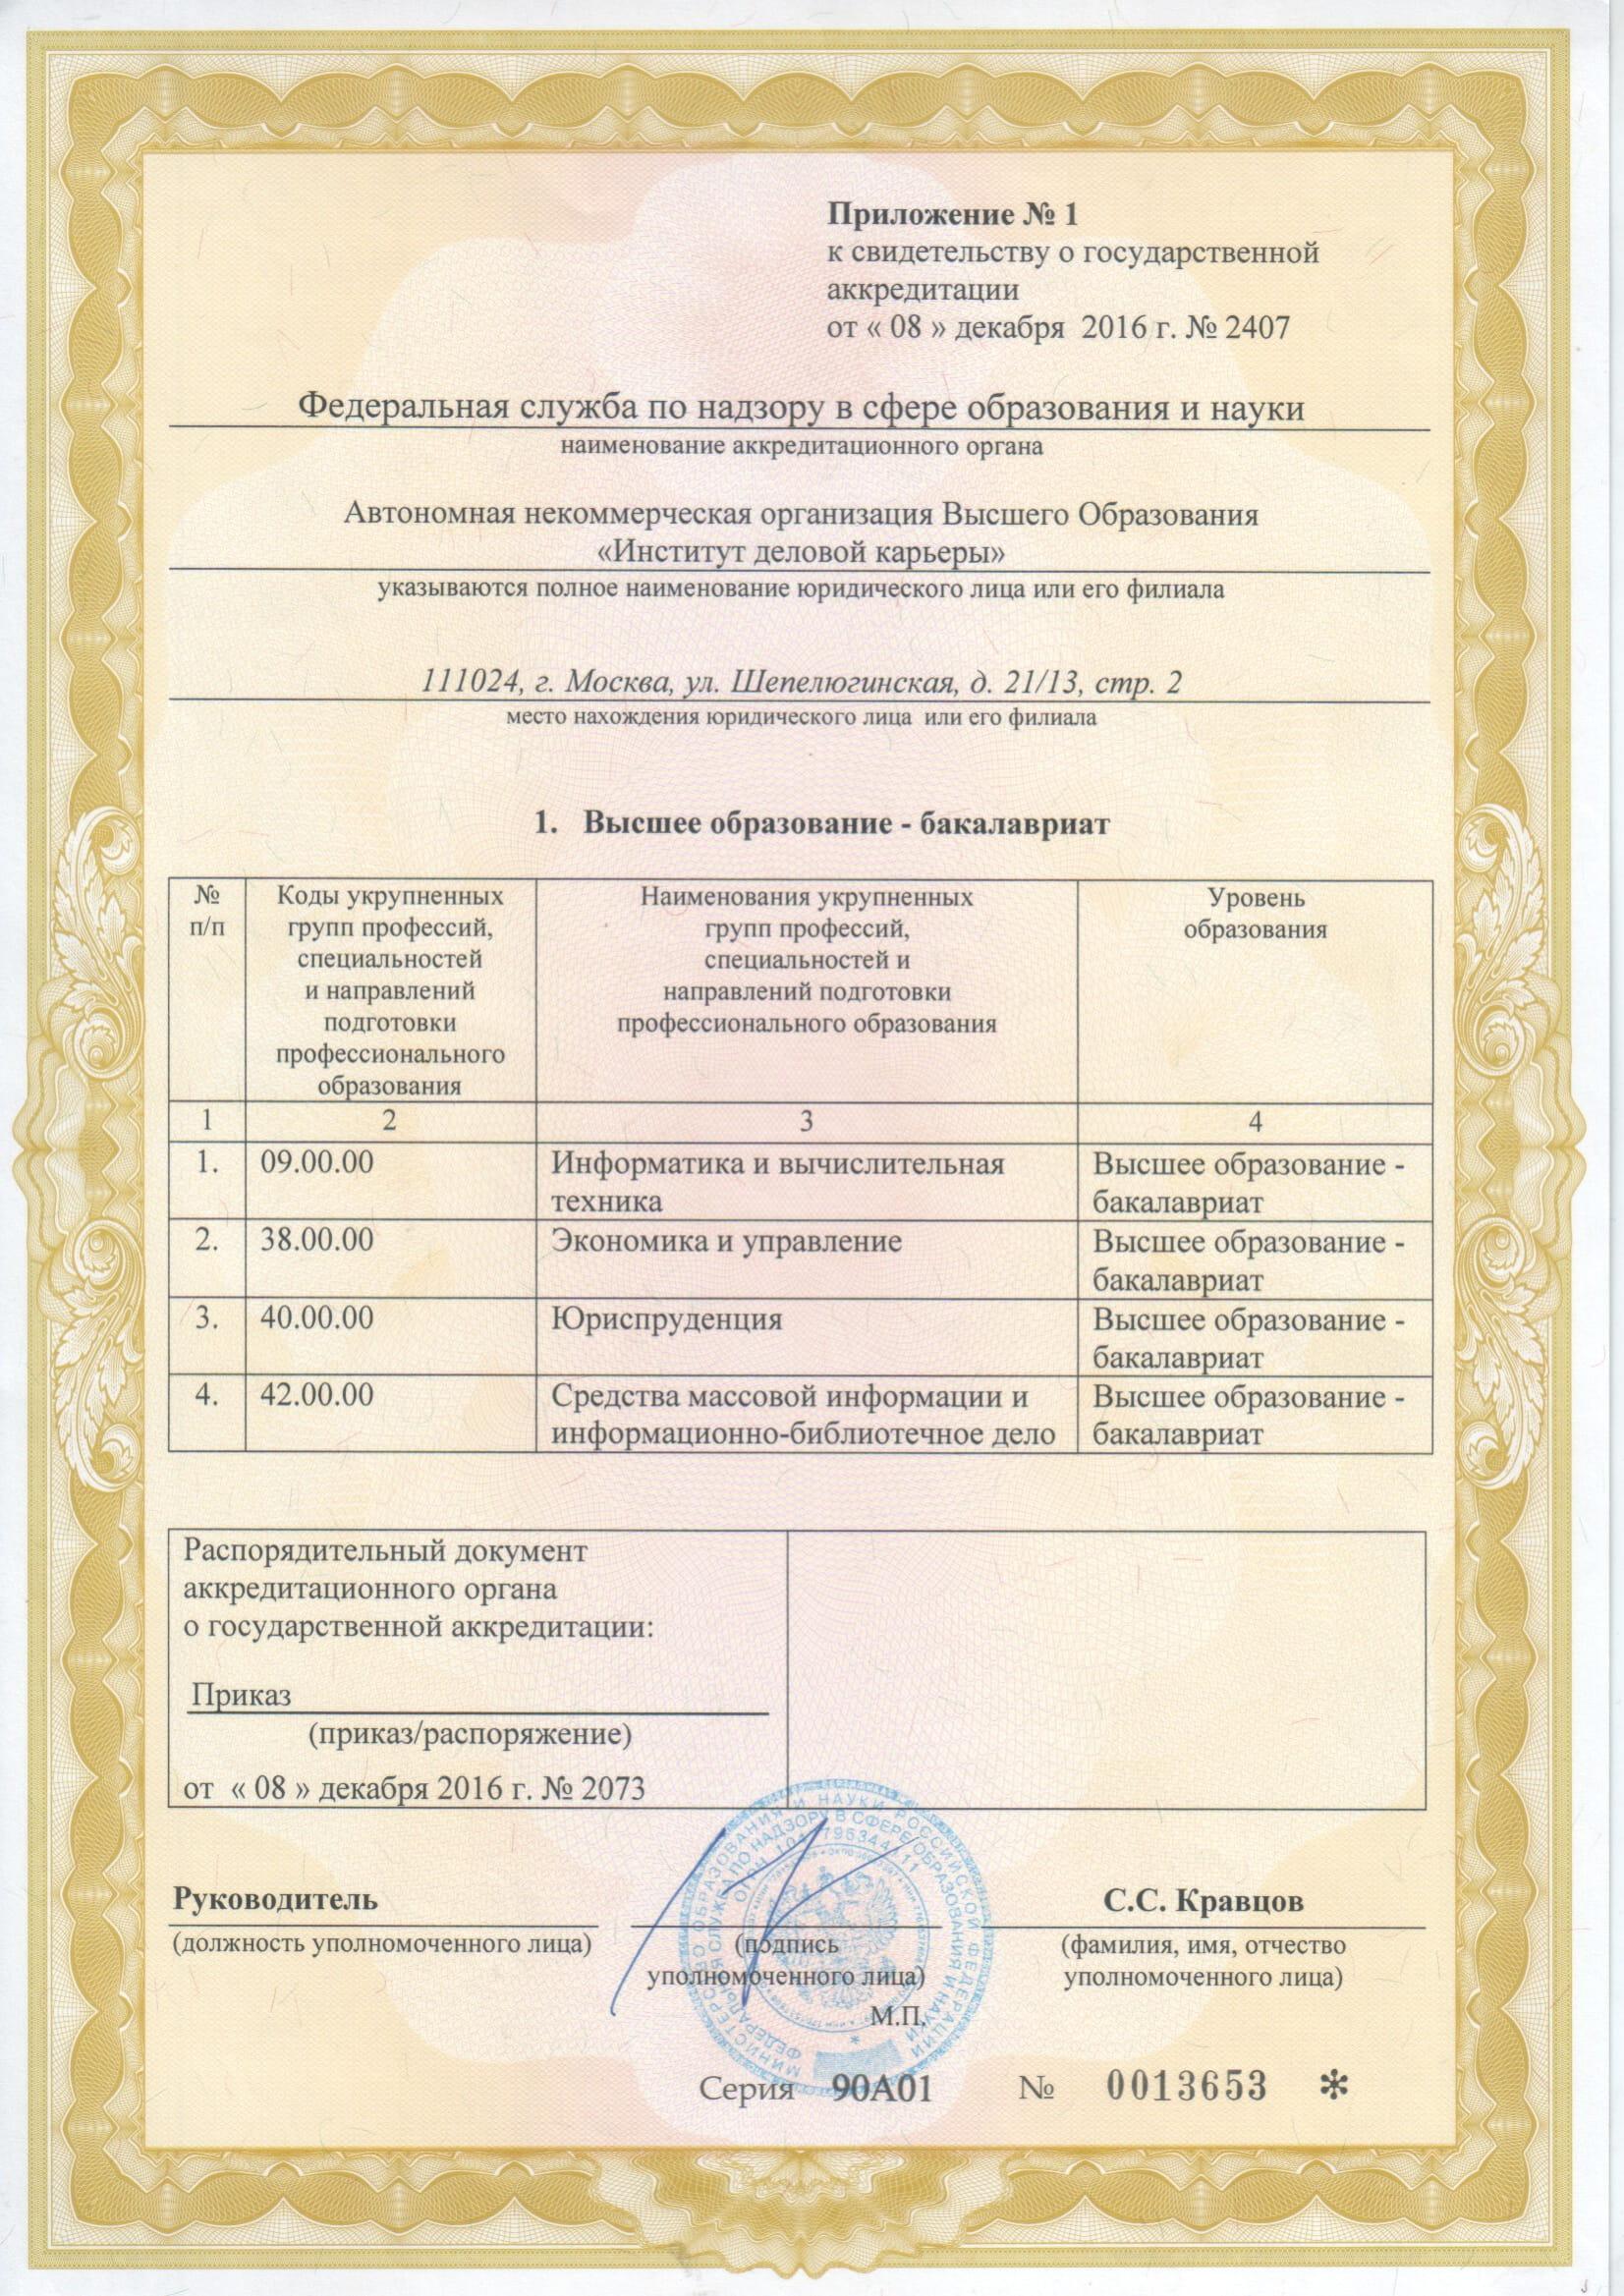 http://departamentvpo.ru/wp-content/uploads/2017/04/Akkreditacia_s_prilosheniem-2.jpg